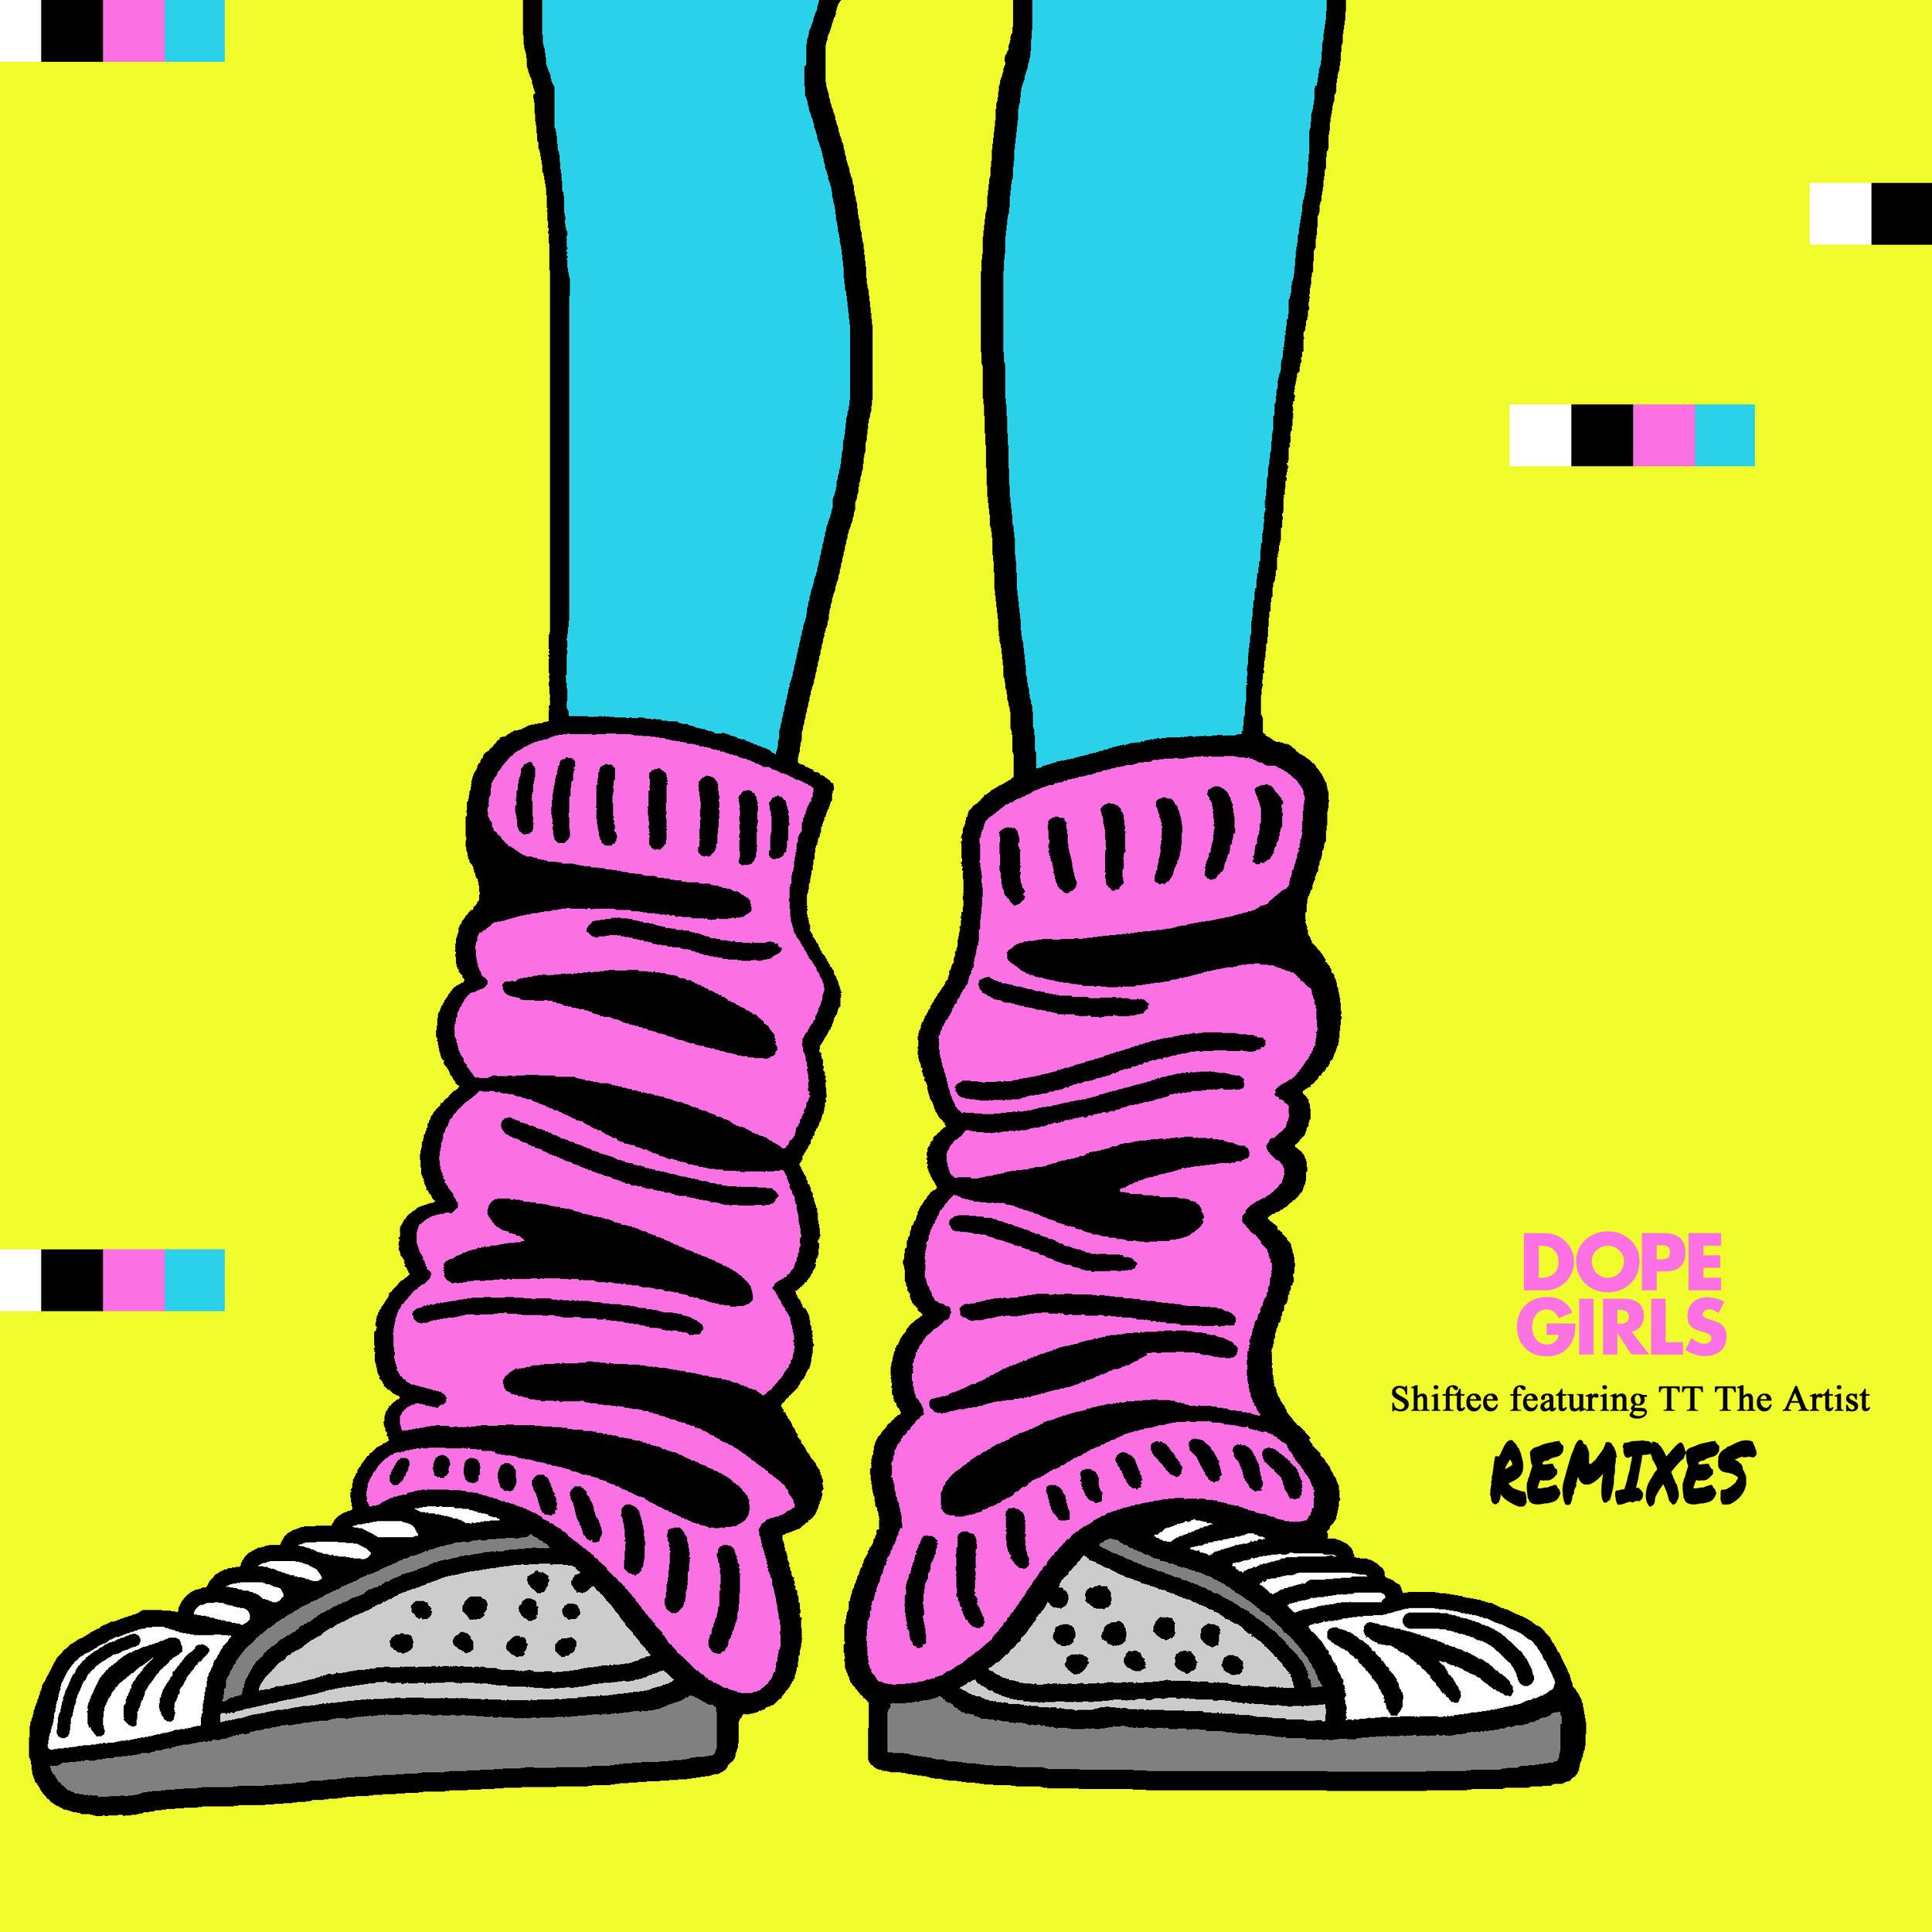 MOM020 - Dope_Girls REMIXES ART.jpg